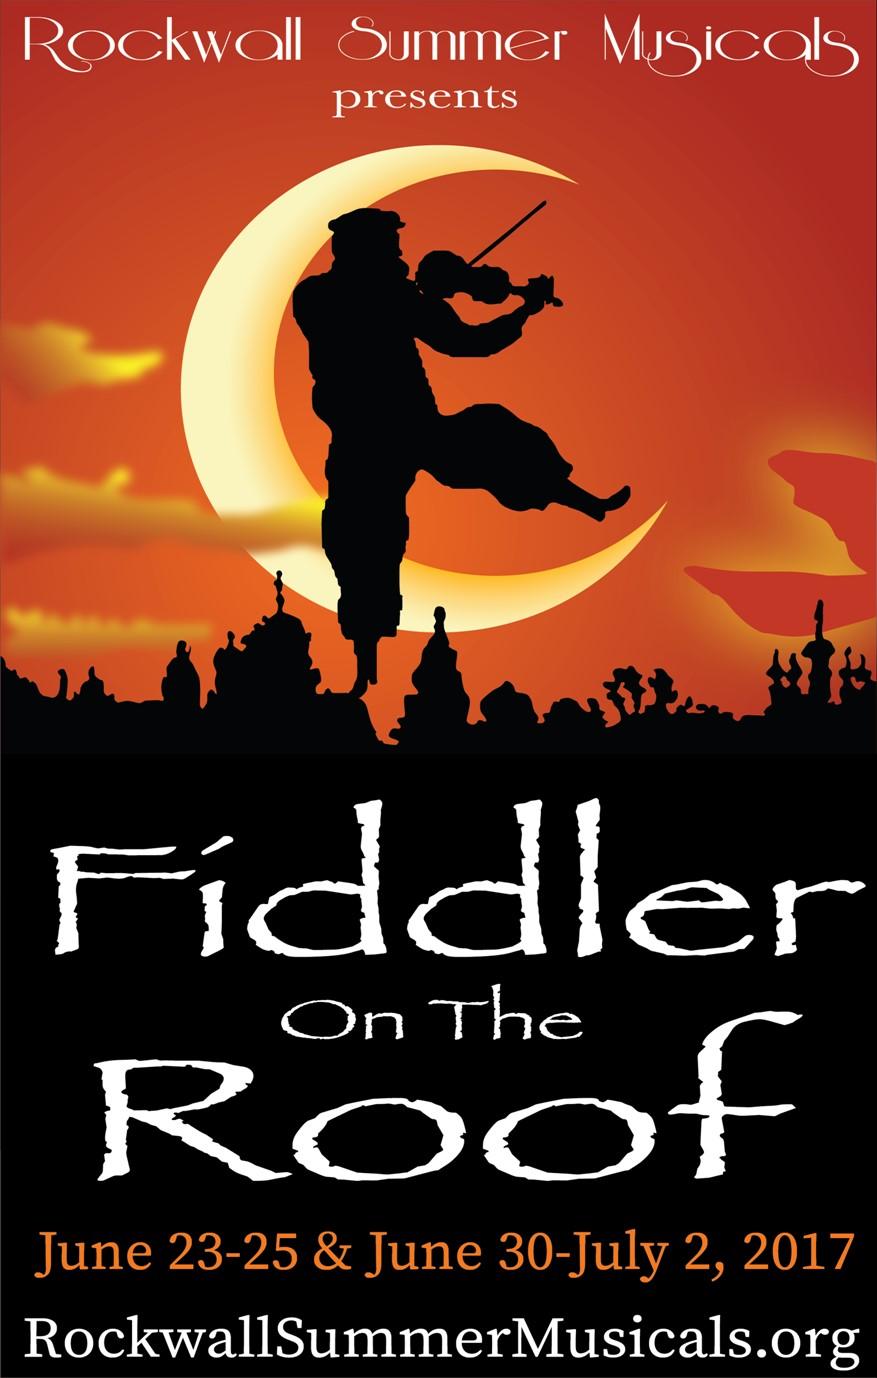 Rockwall Summer Musicals presents Fiddler on the Roof June 23 – July 2